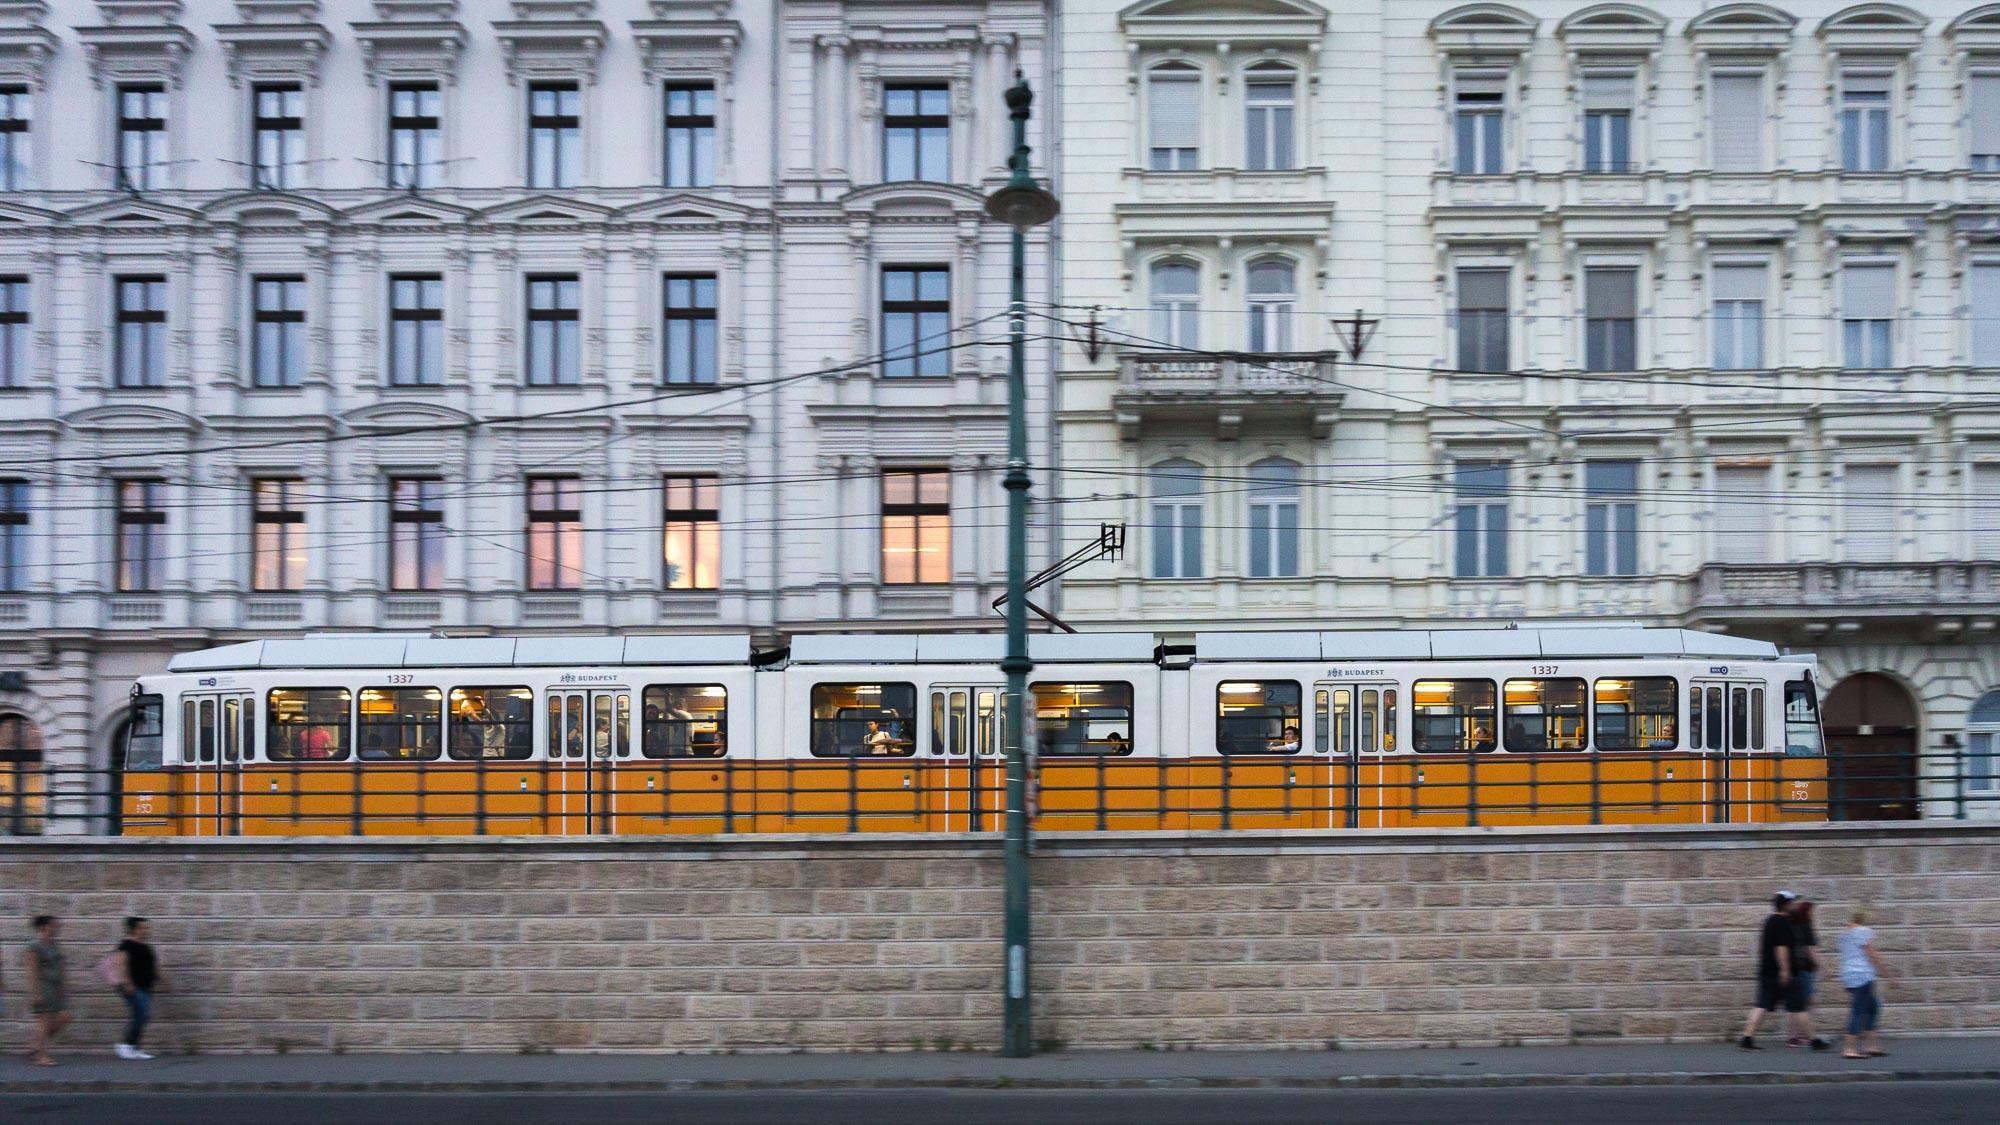 ollo / Strassenbahn 2 am Donauufer in Budapest